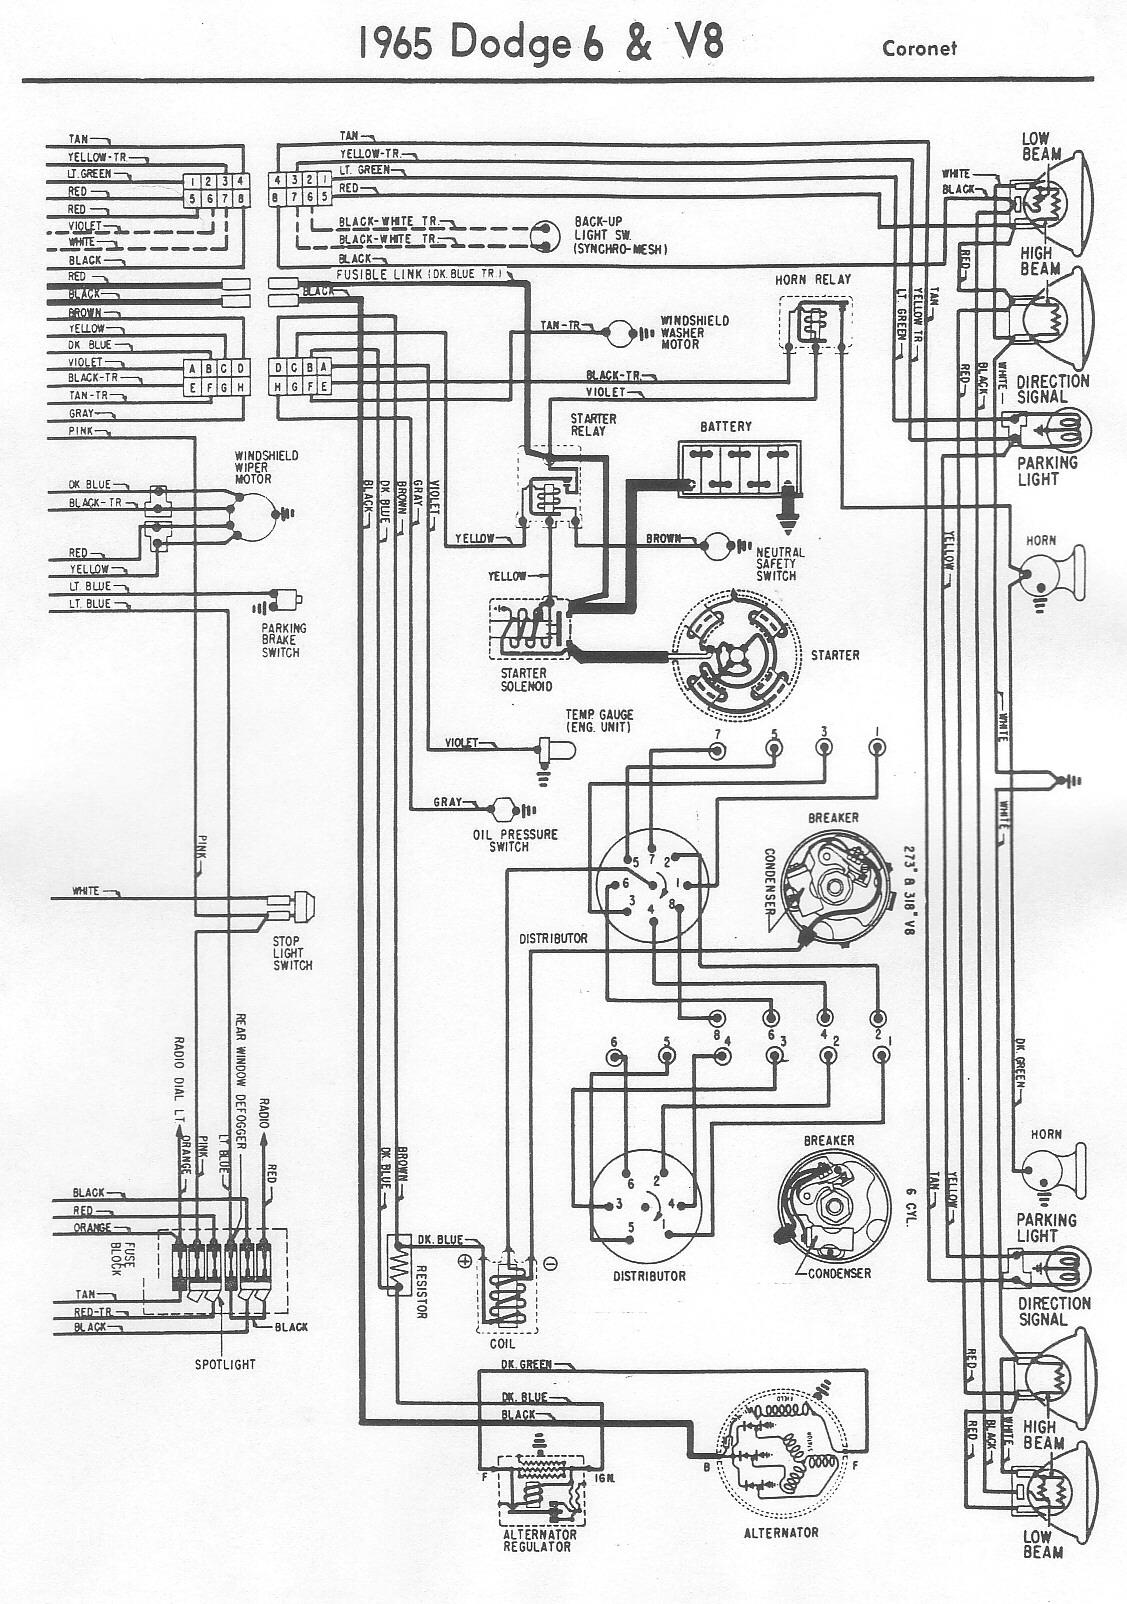 1965 dodge dart wiring diagram